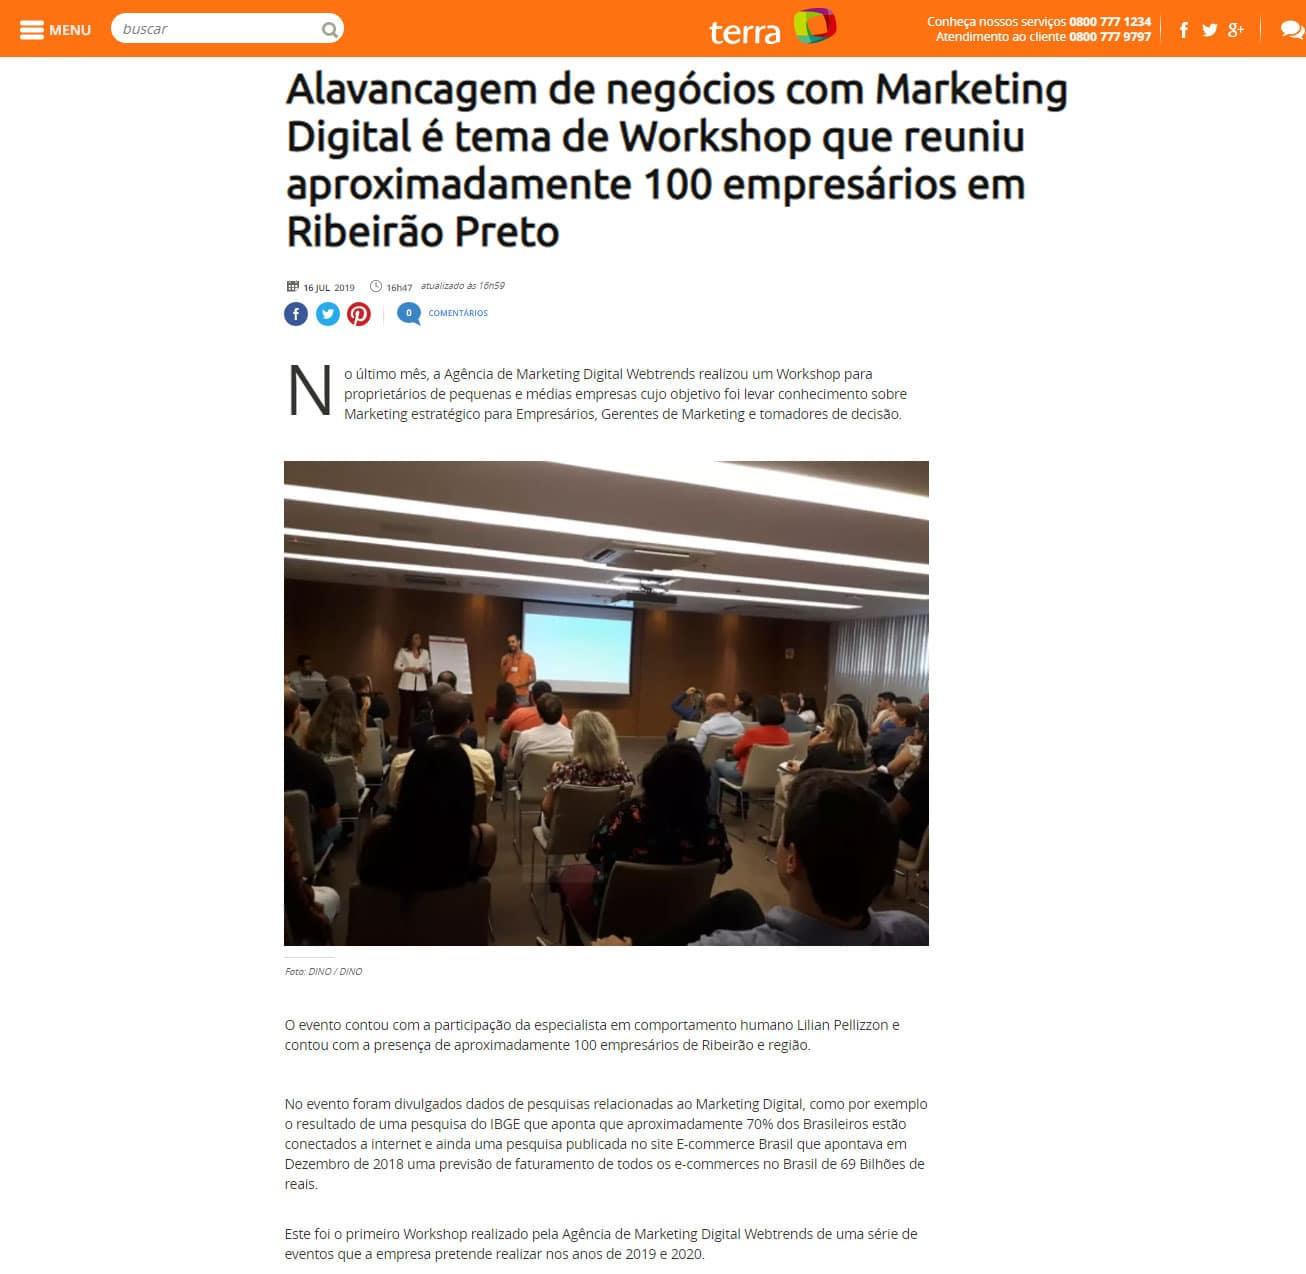 https://webtrends.net.br/wp-content/uploads/2020/02/terra4.jpg